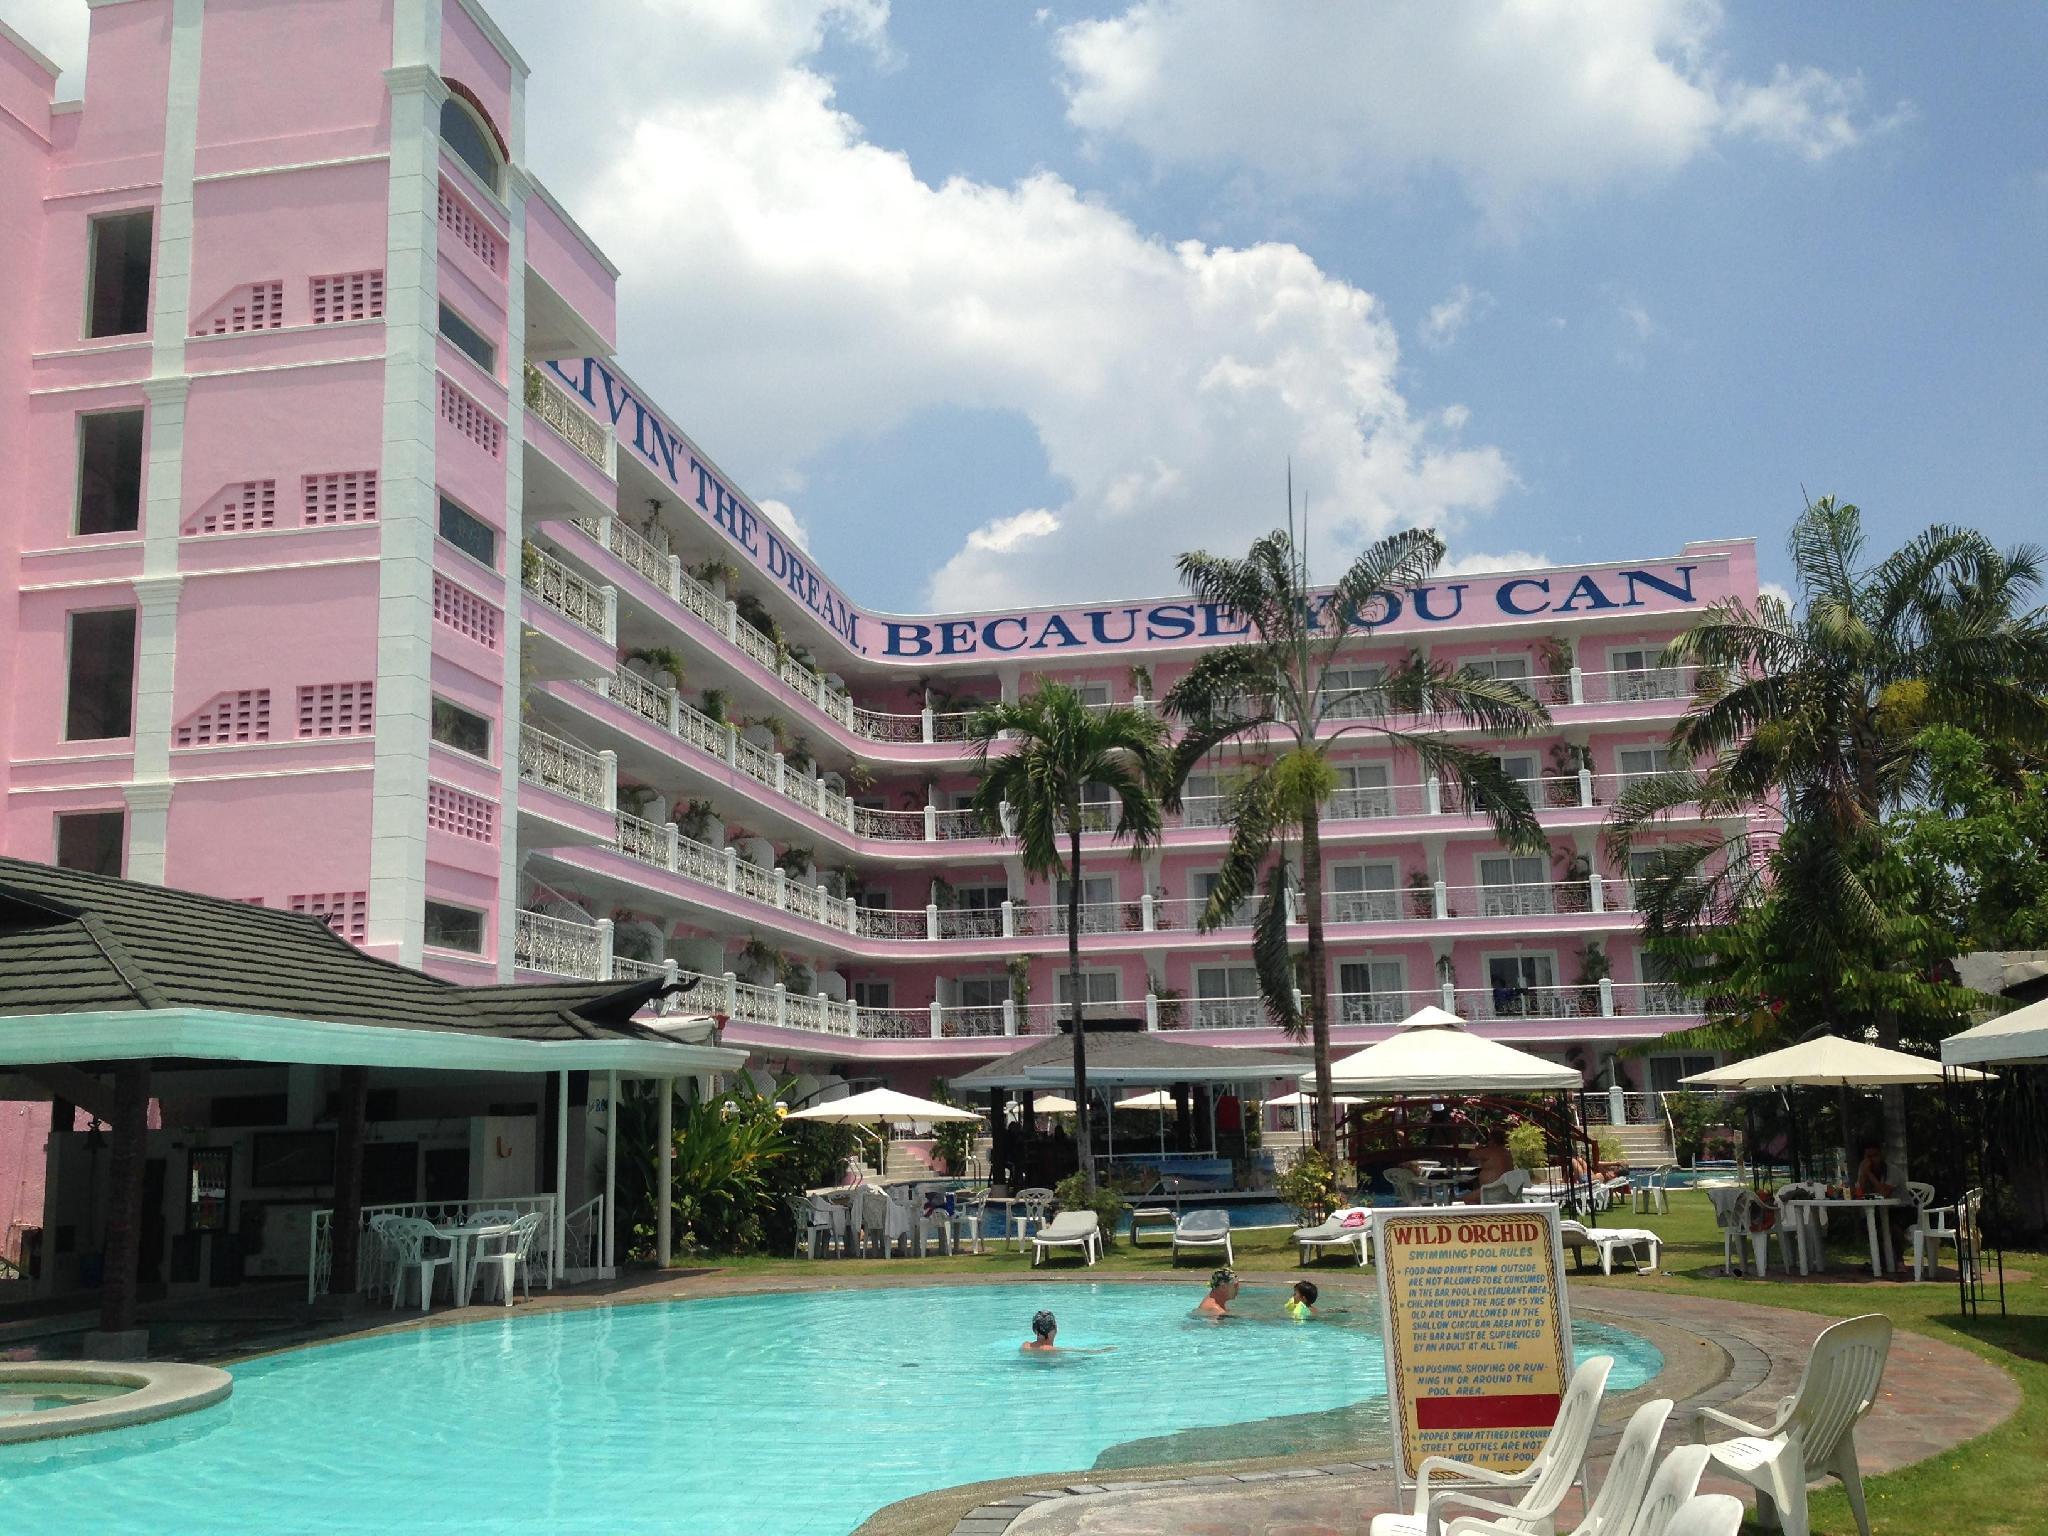 Wild Orchid Lagoon Resort